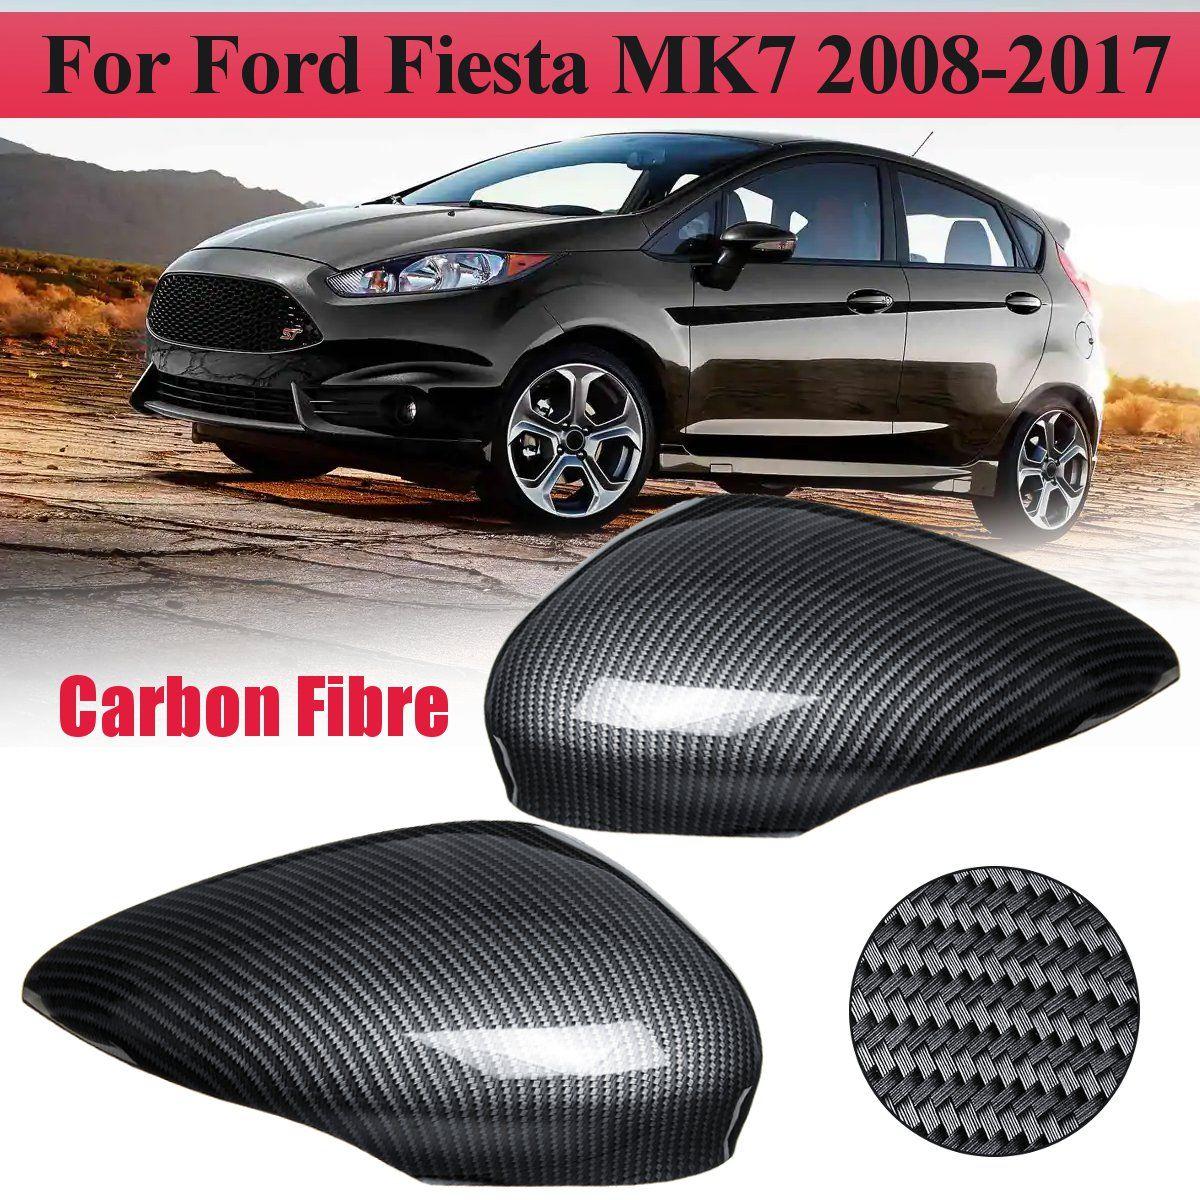 Koolzap 2008 2009 2010 2011 2012 2013 2014 2015 2016 2017: For Ford For Fiesta MK7 2008 2009 2010 2011 2012 2013 2014